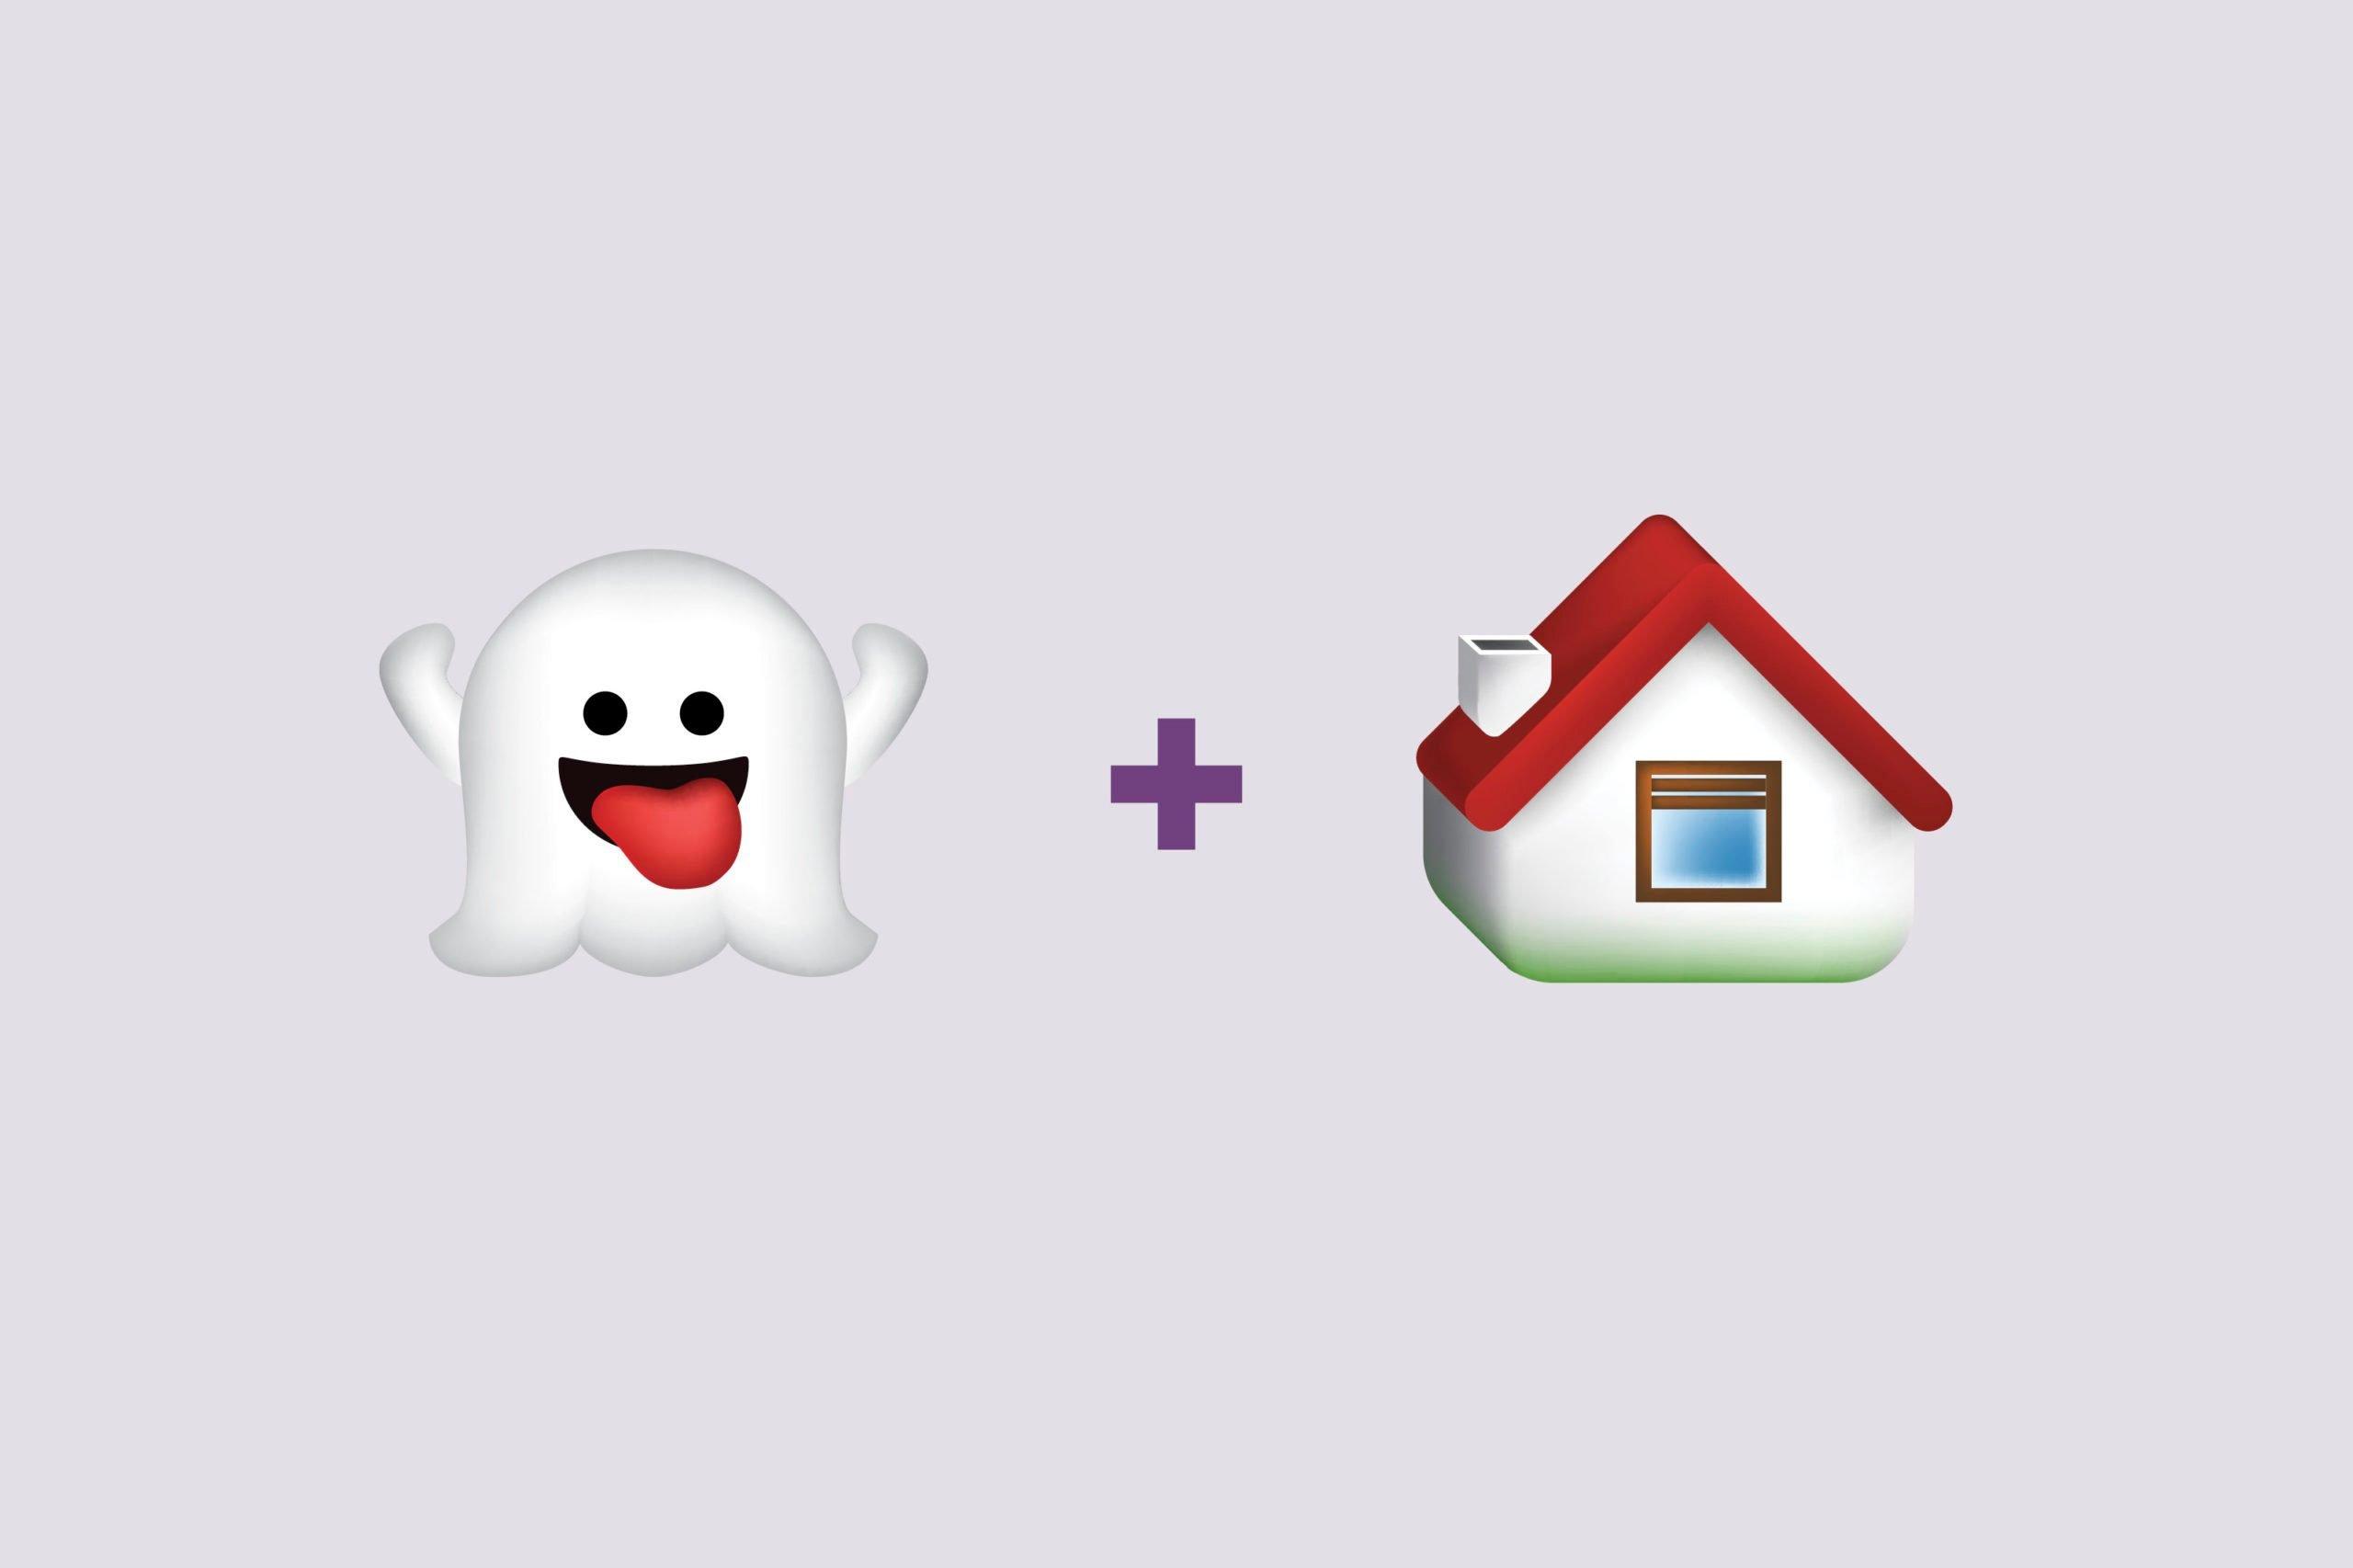 Ghost emoji + house emoji